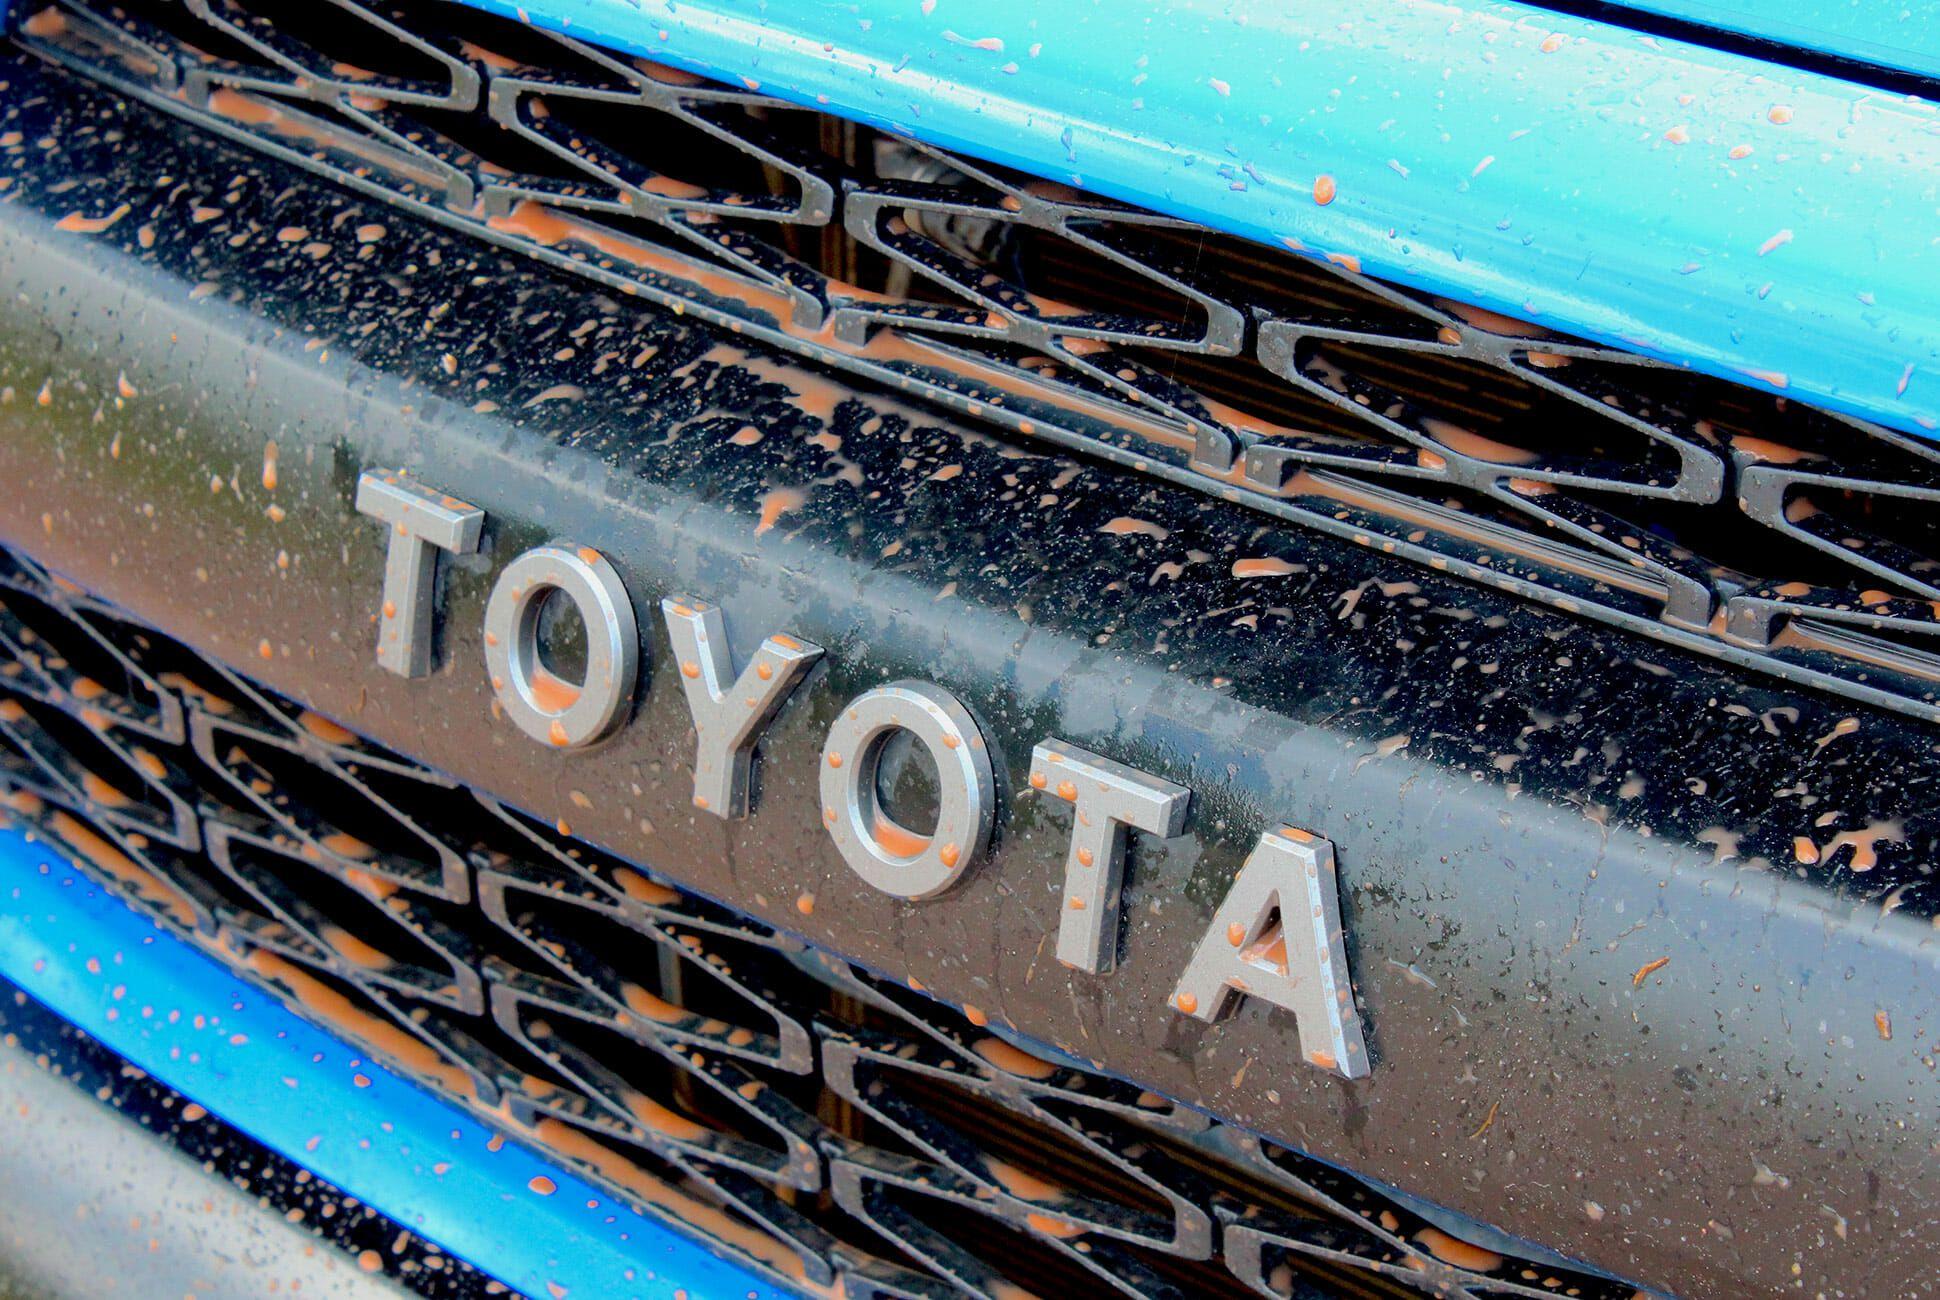 2019-Toyota-4Runner-TRD-Pro-gear-patrol-slide-4